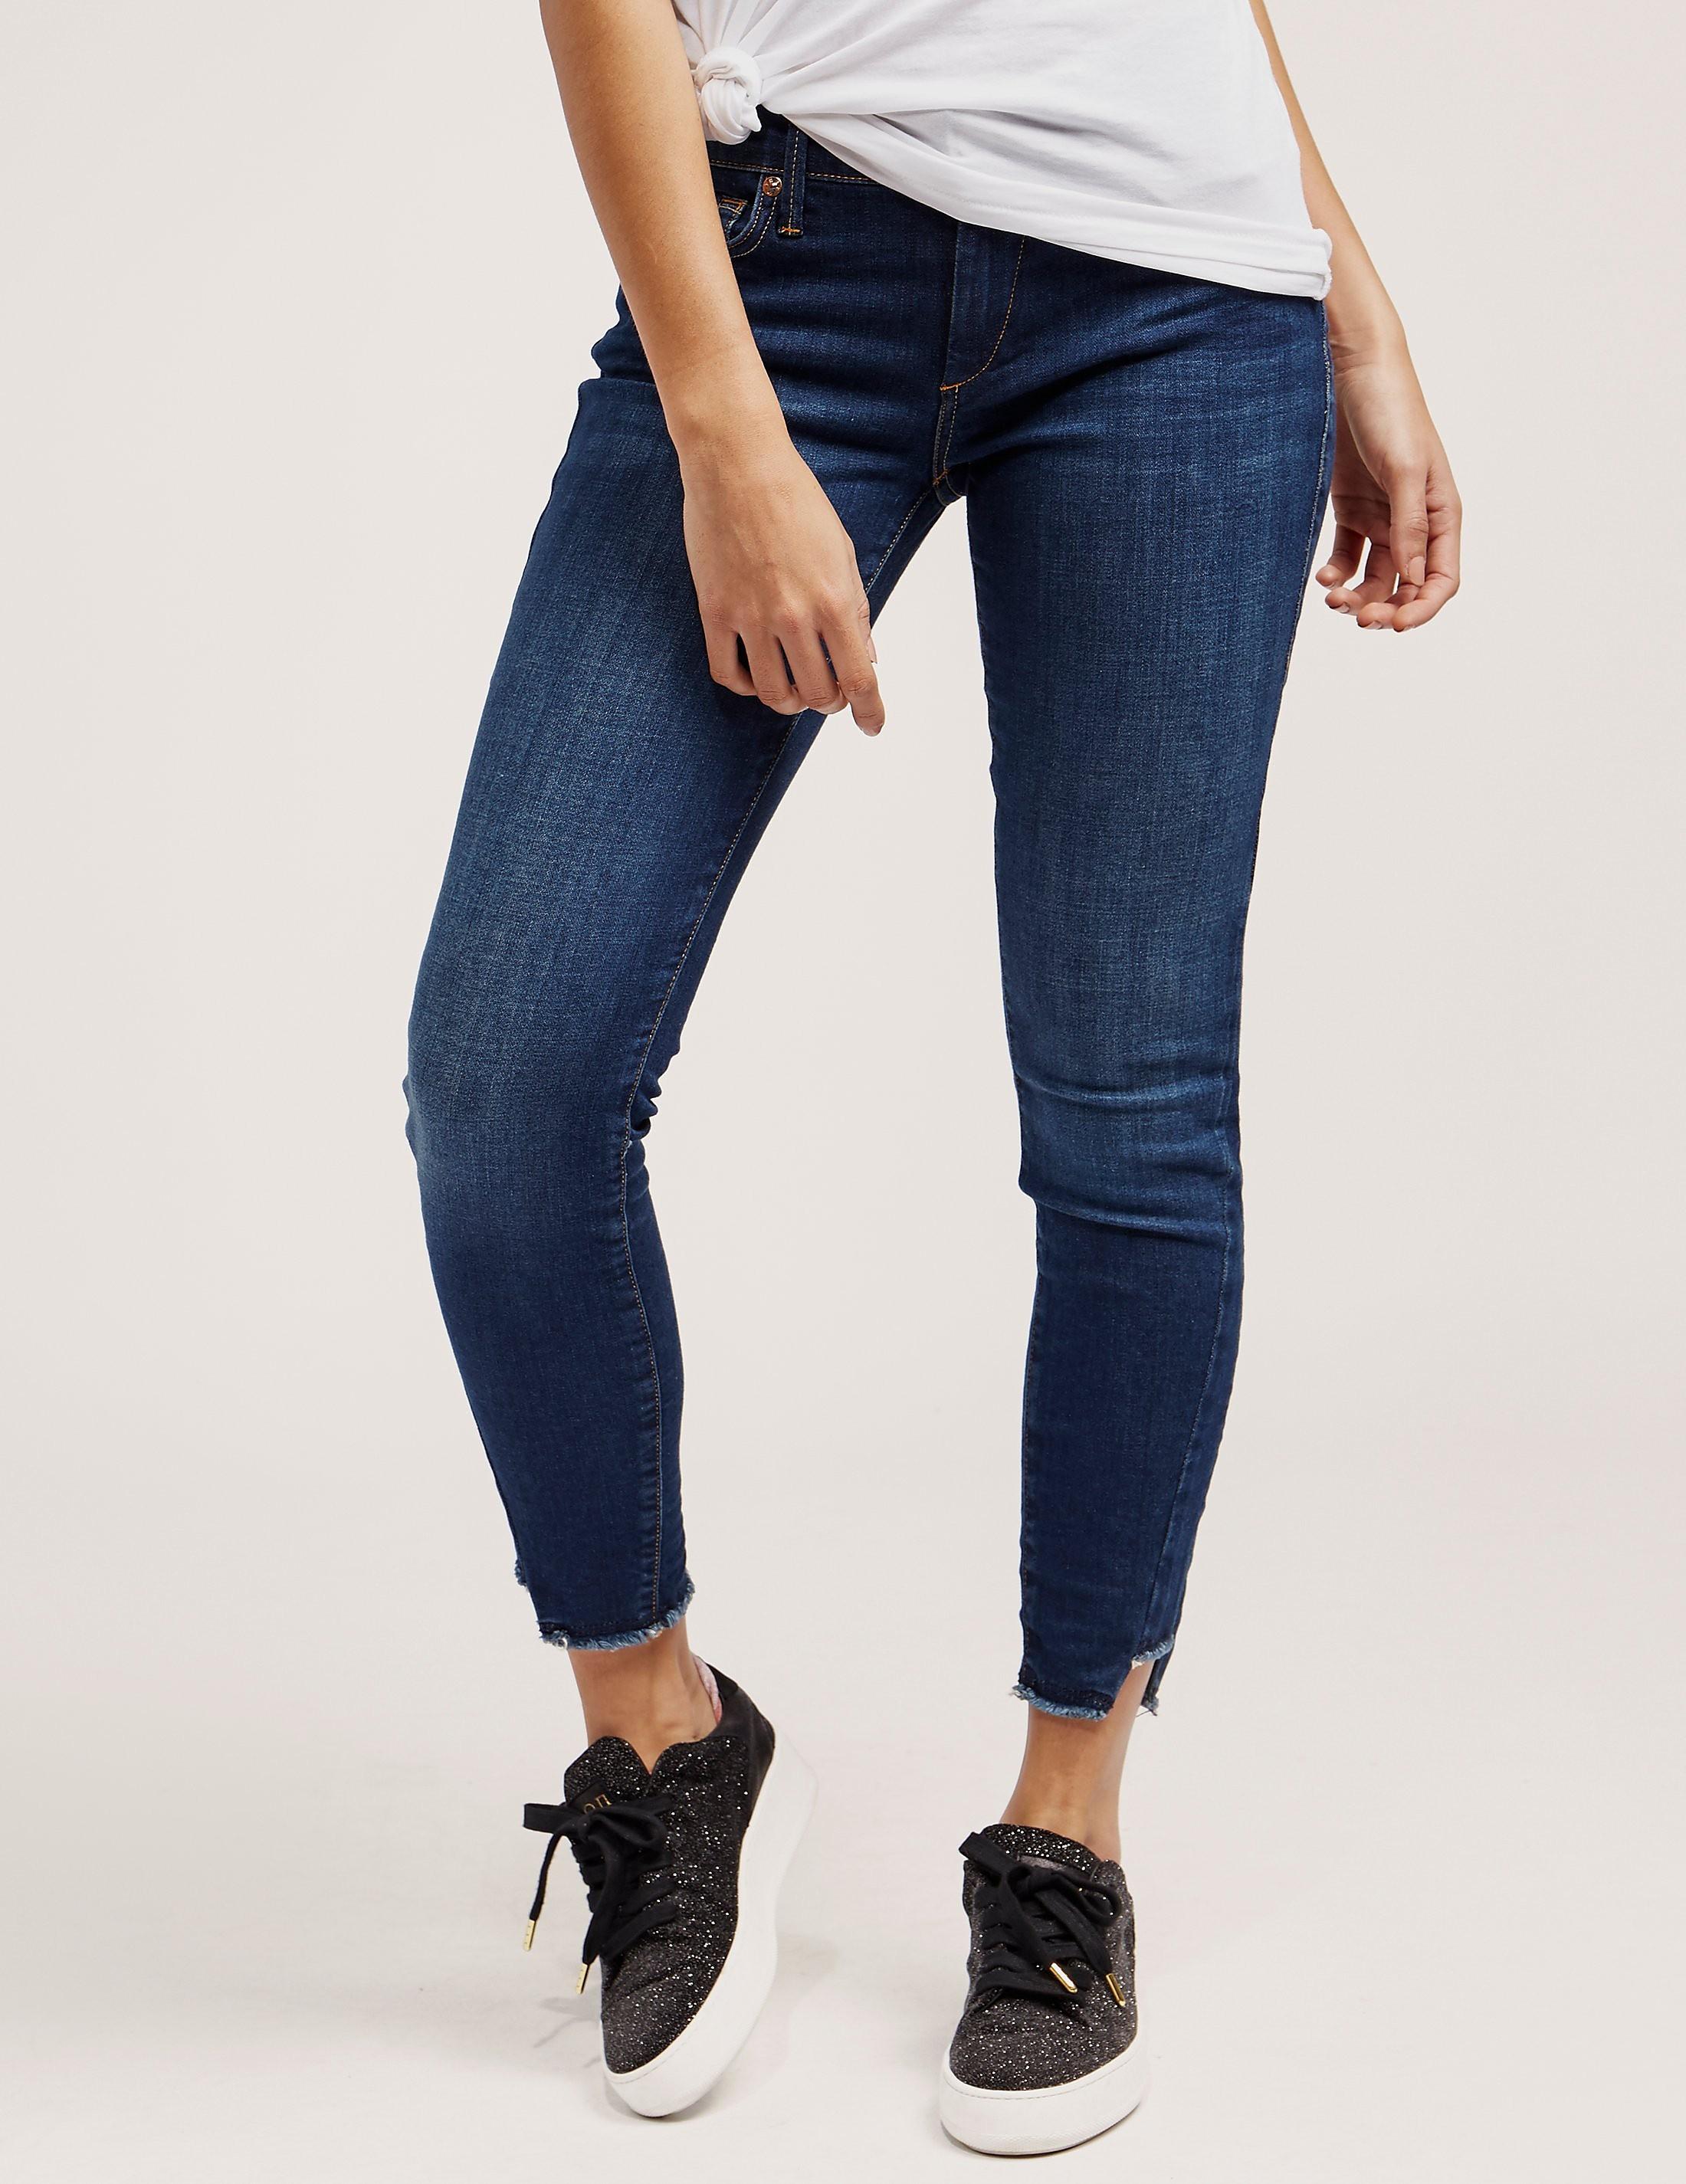 True Religion Halle Jeans